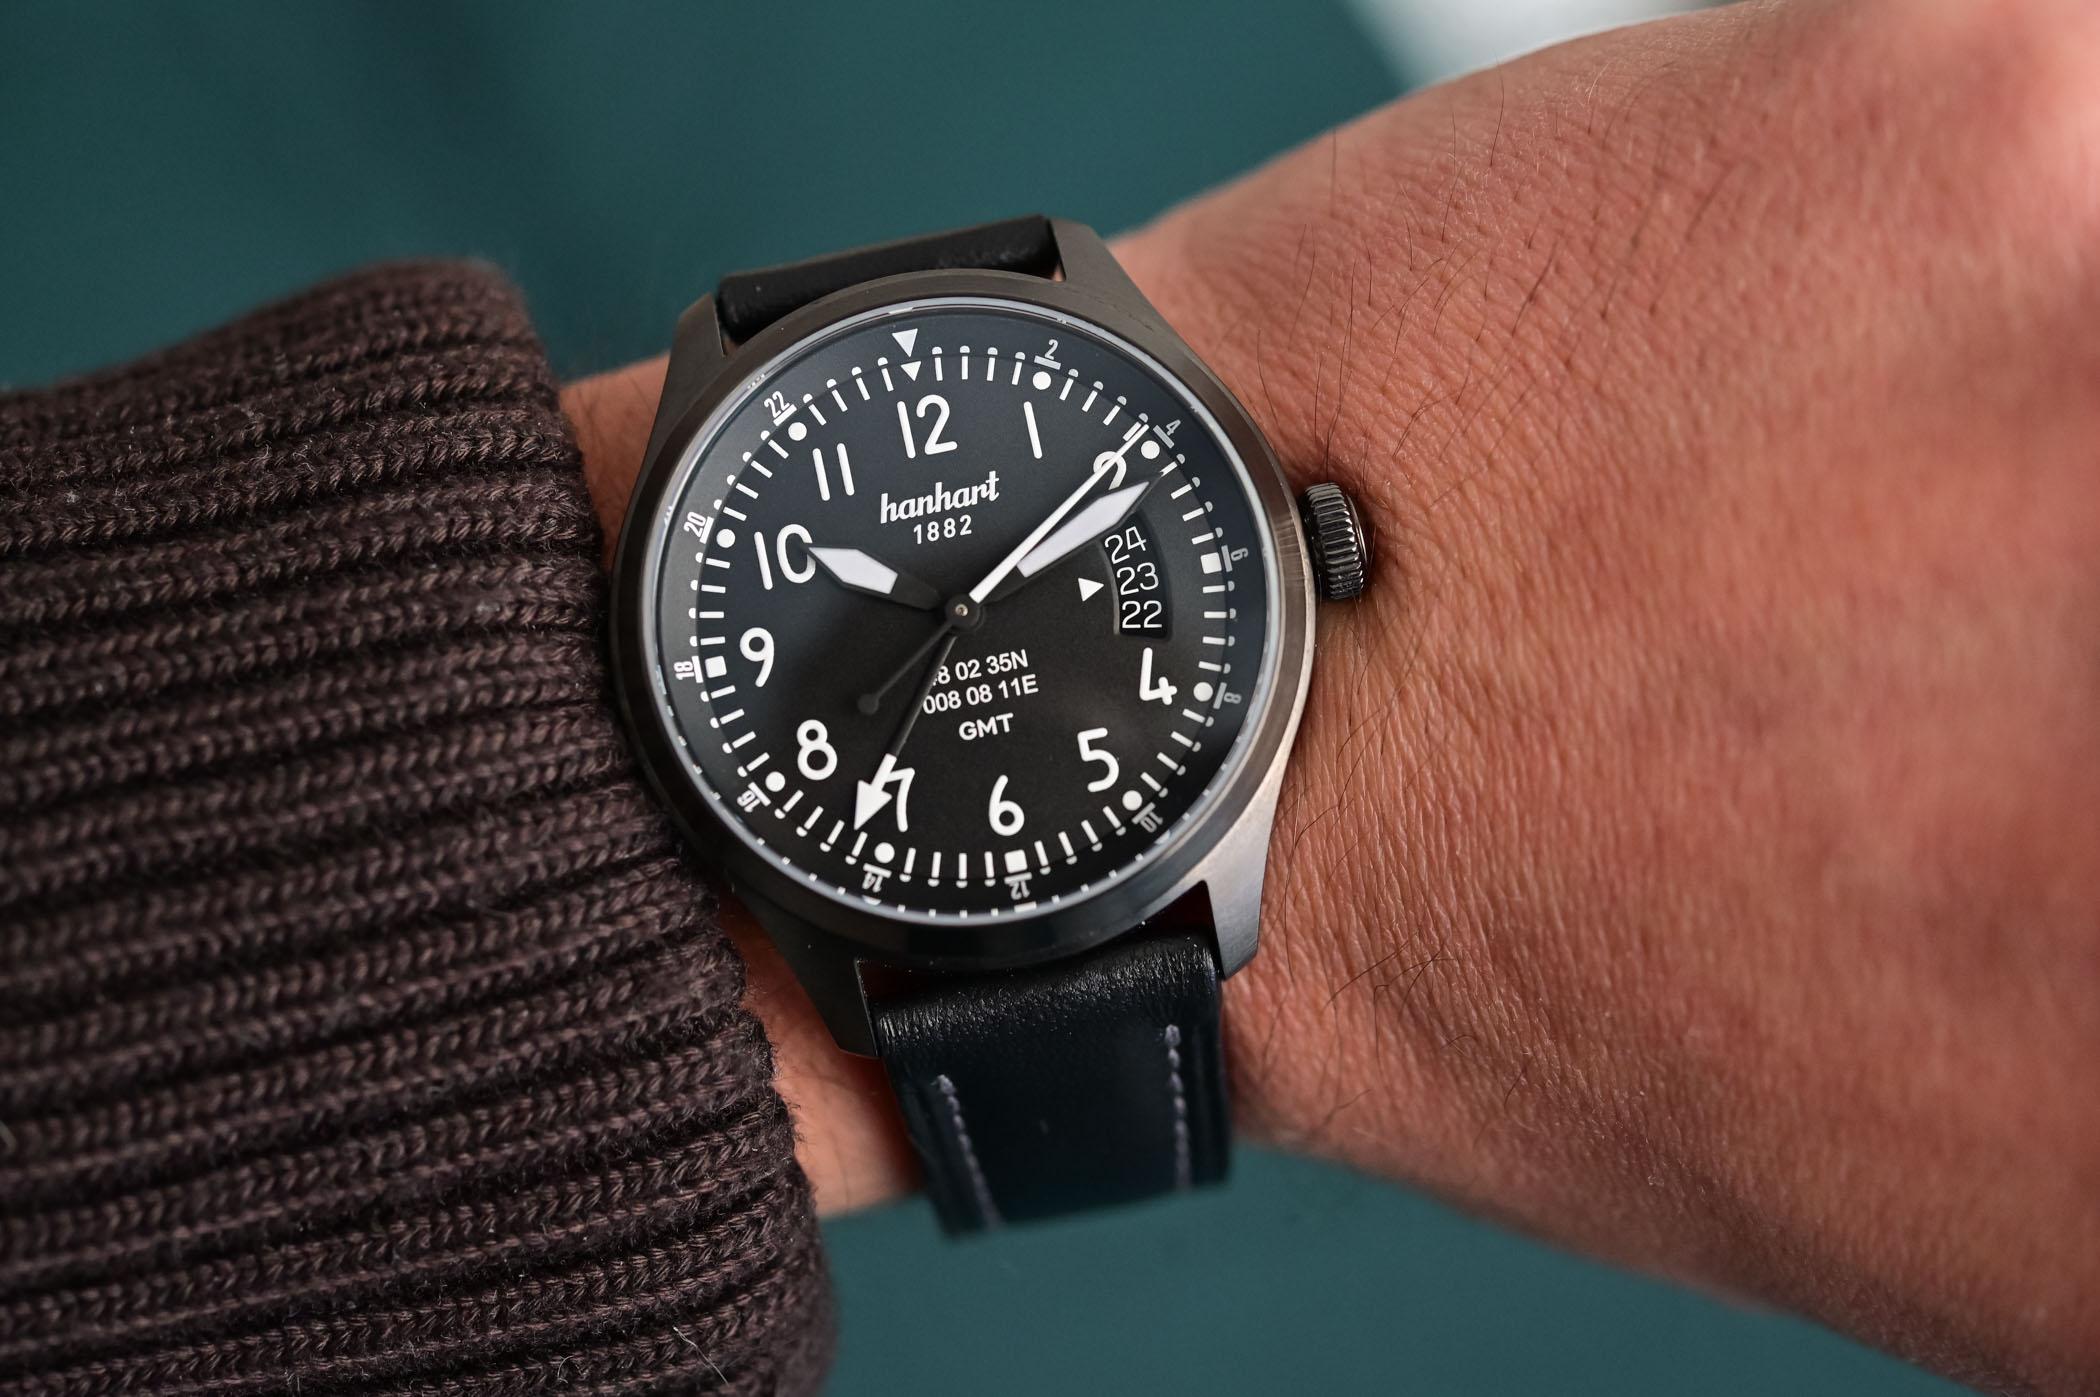 Hanhart S-Series 105 OE GMT